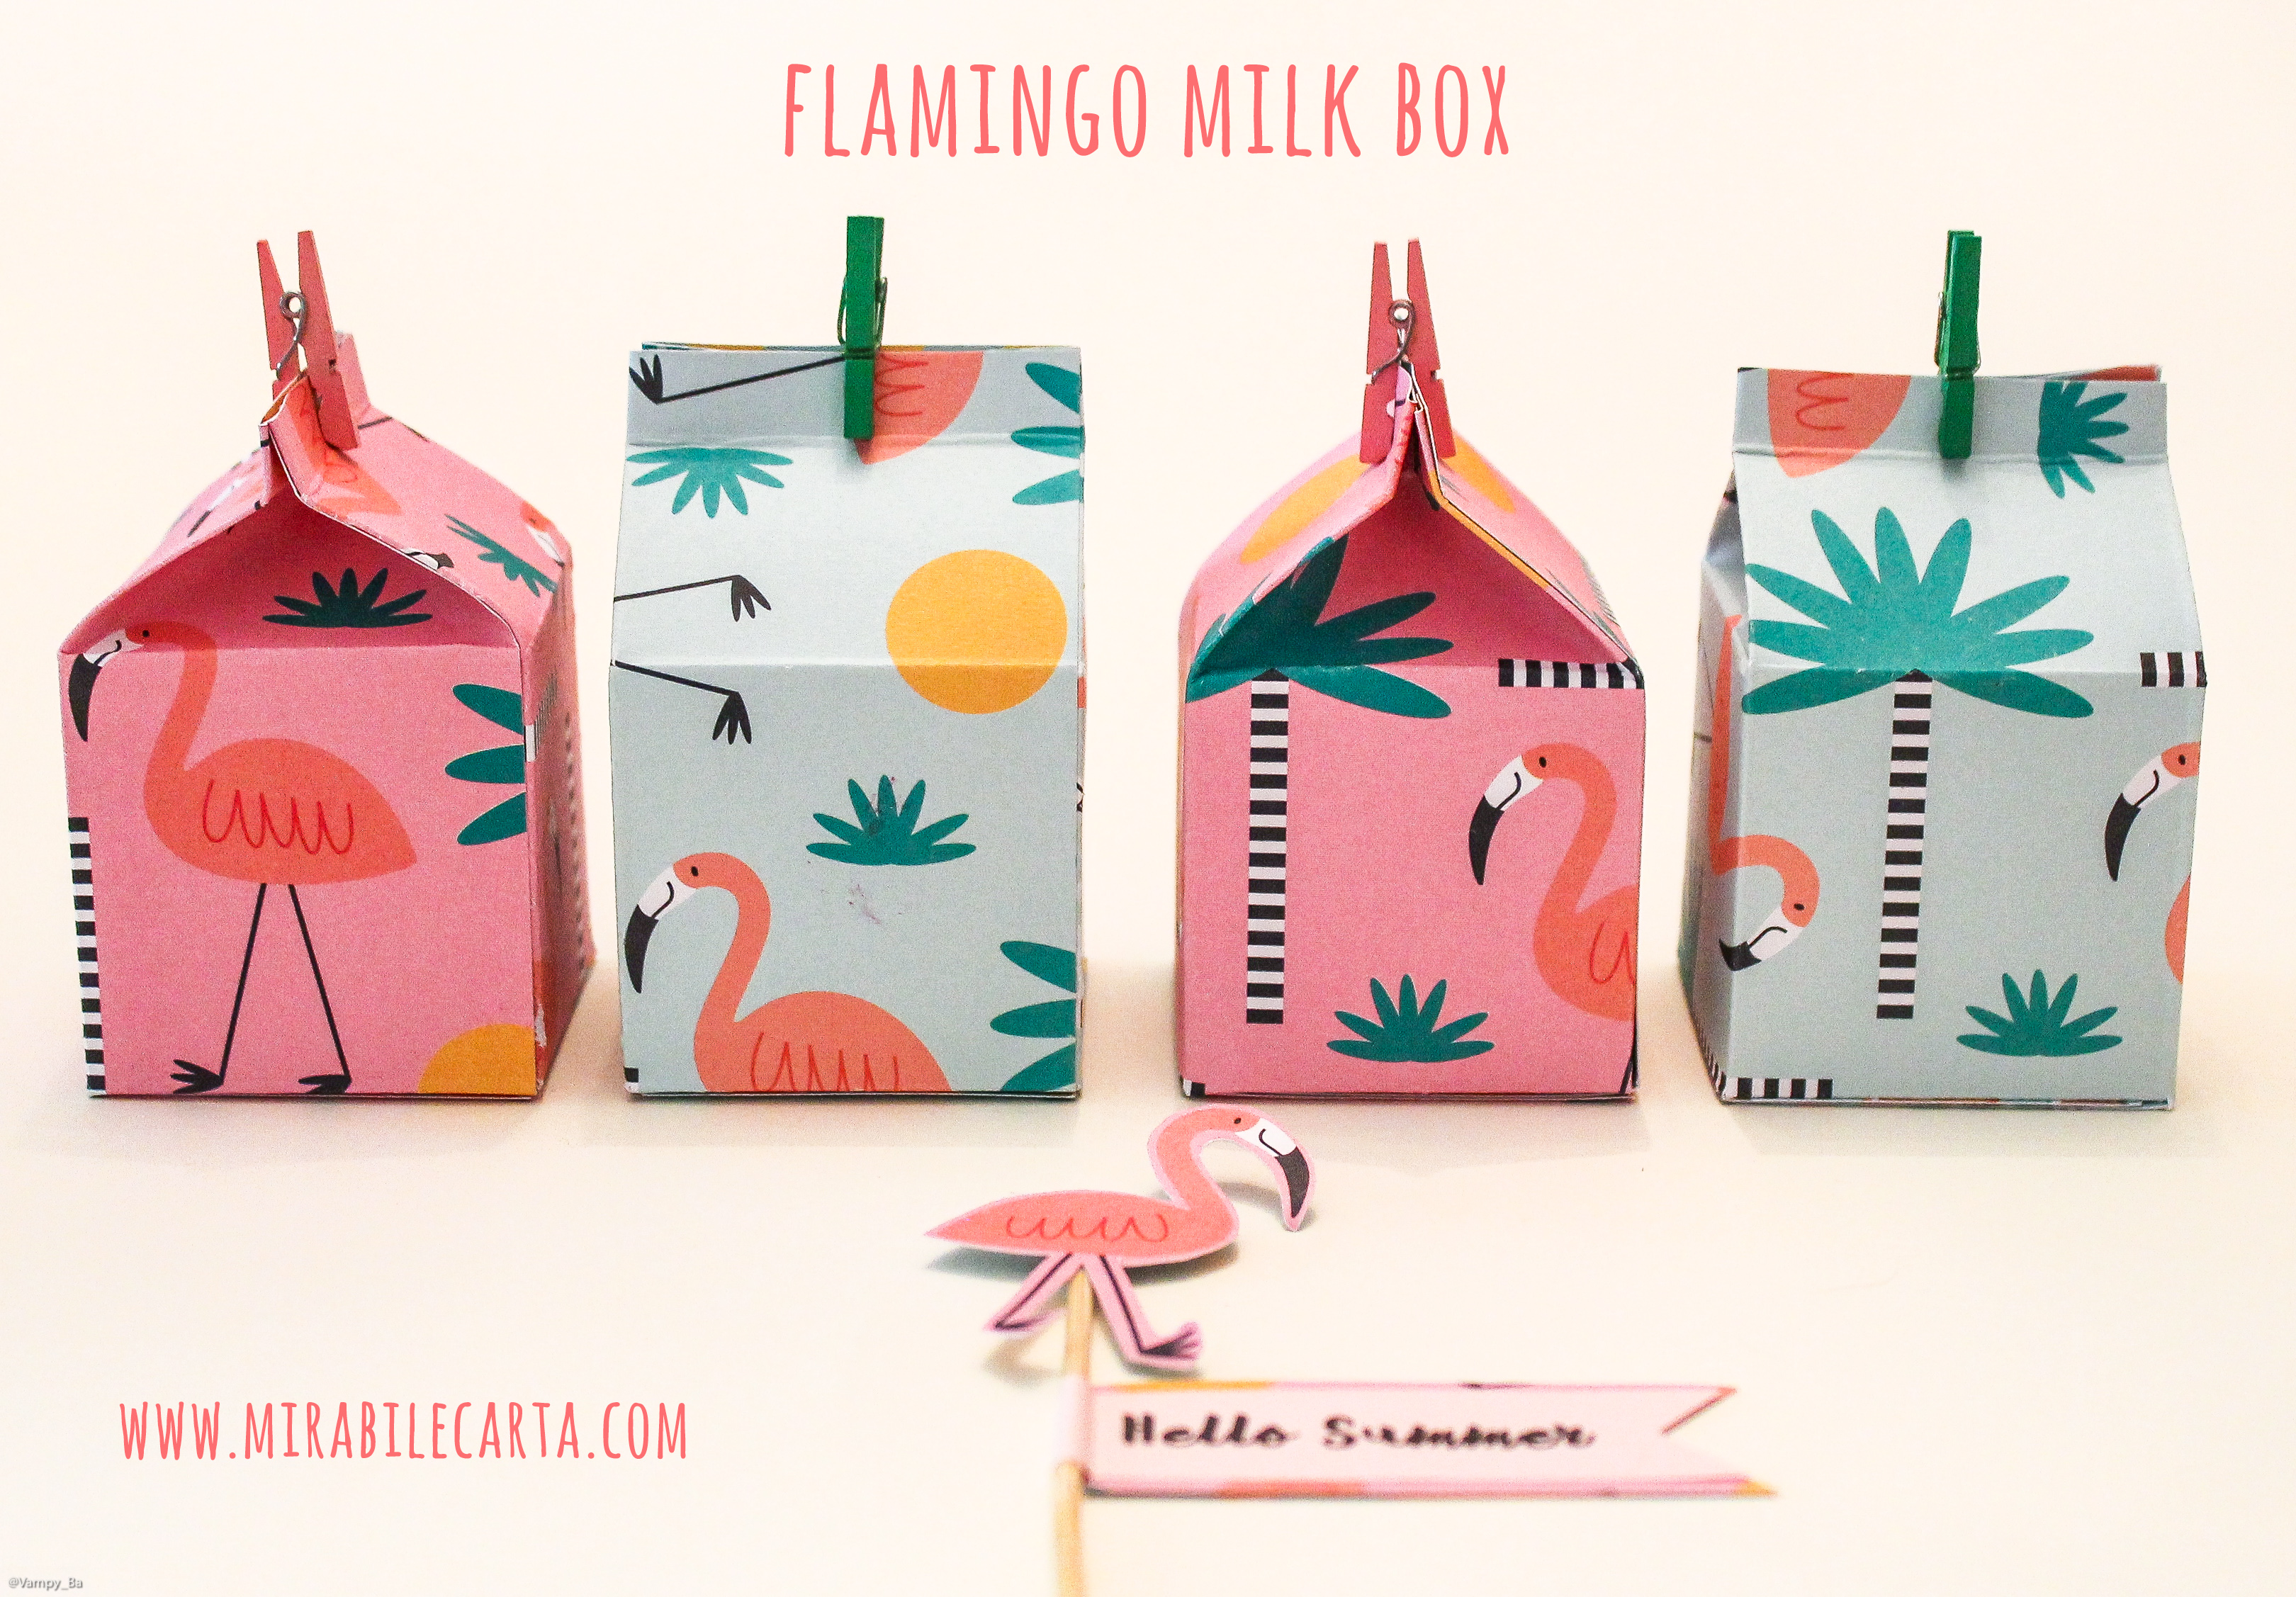 FlamingoMilkBox_mirabilecarta09.jpg